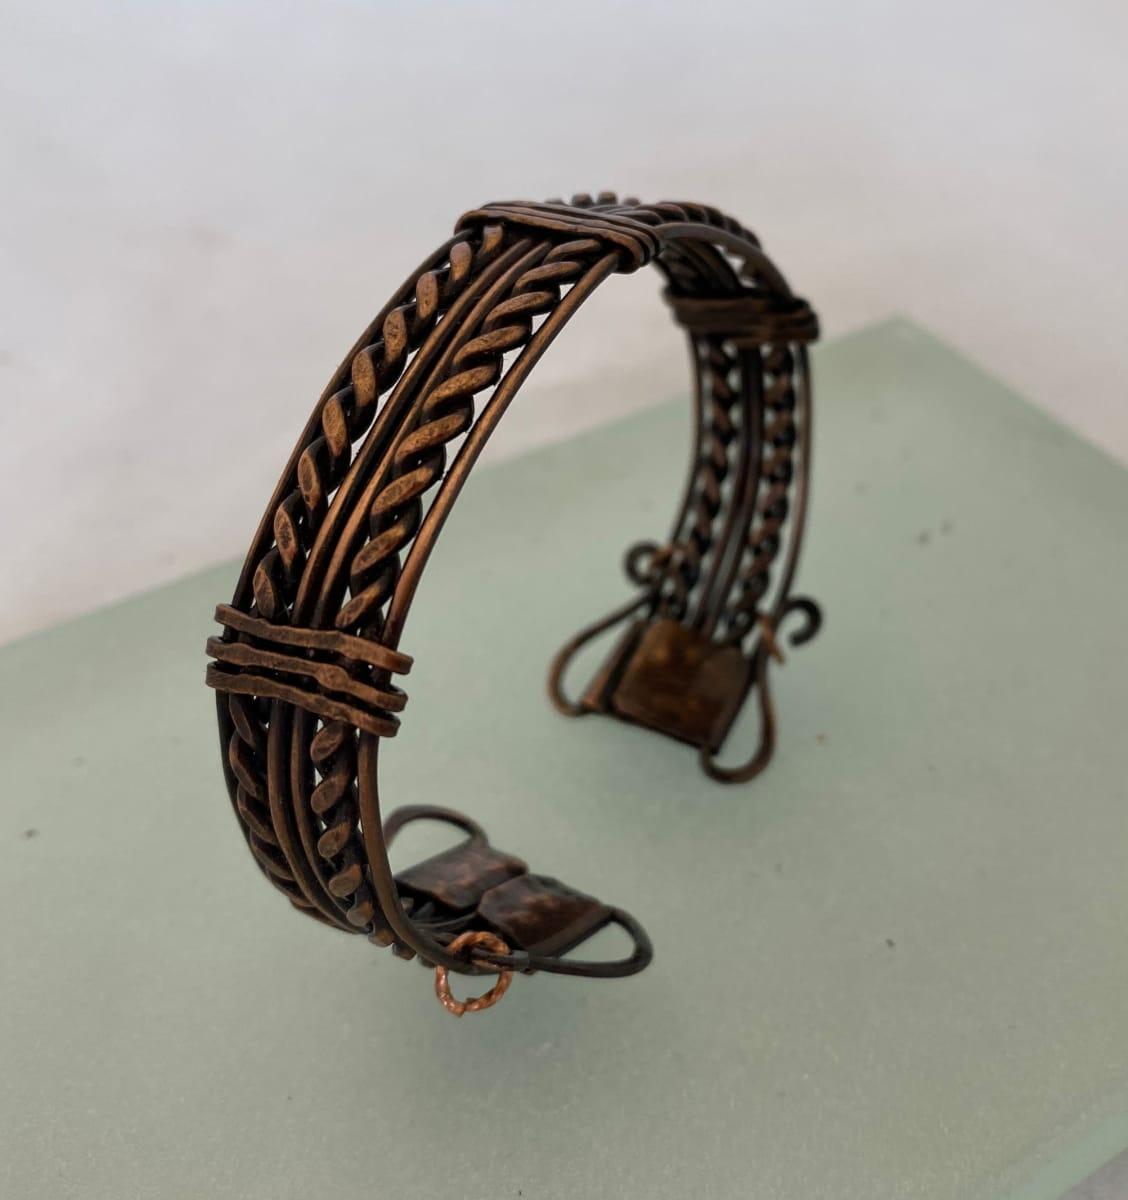 Copper Bracelets by Therese Miskulin